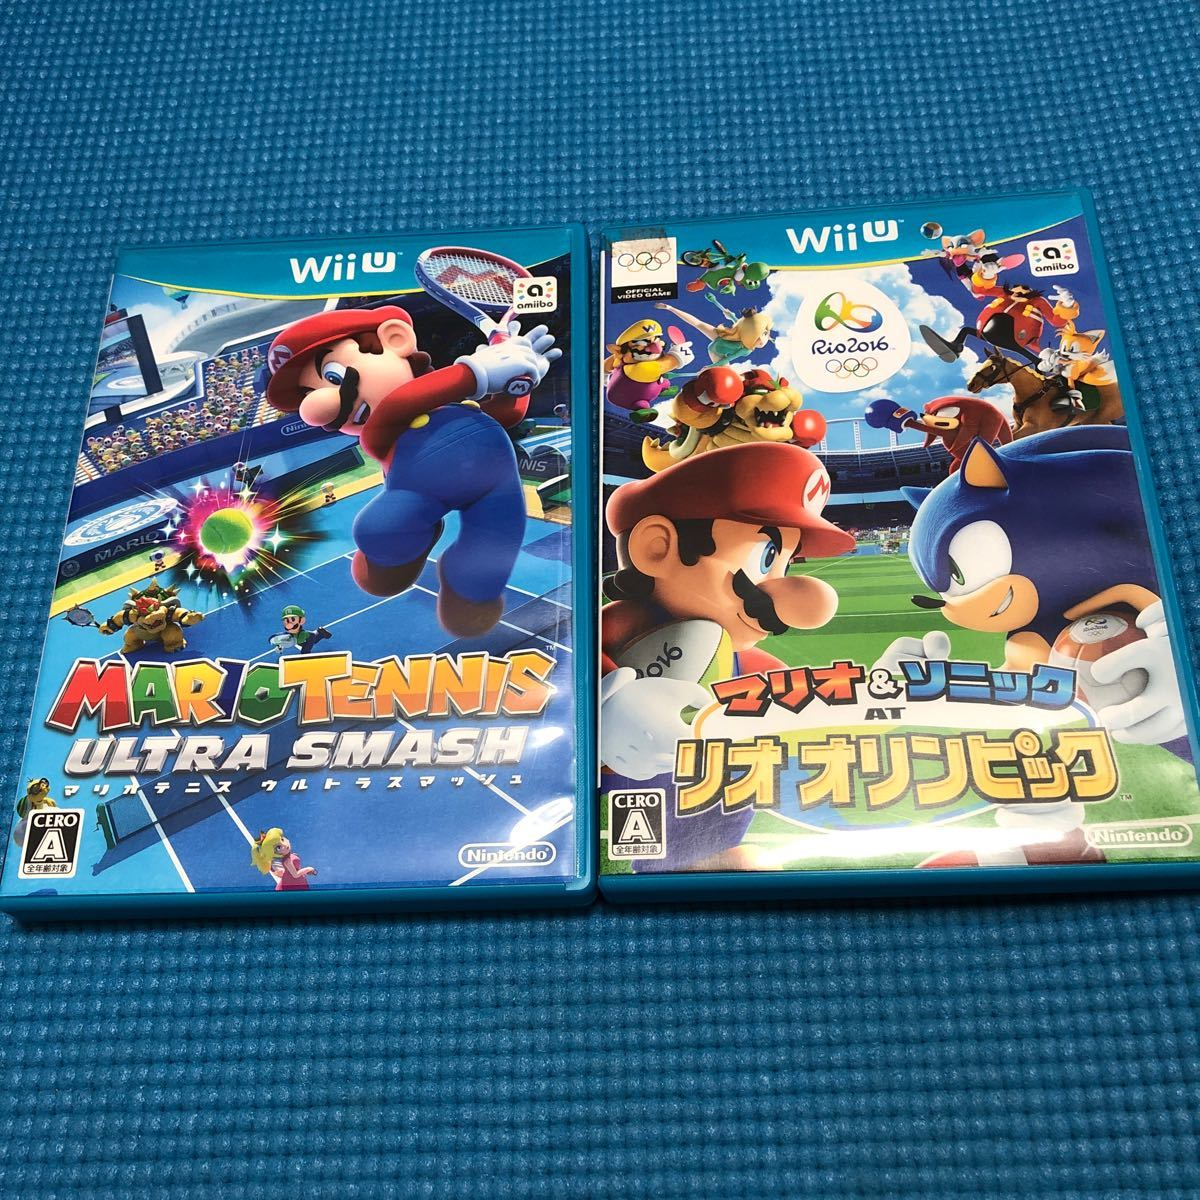 【Wii U】 マリオテニス ウルトラスマッシュ、マリオ&ソニックatリオオリンピックセット